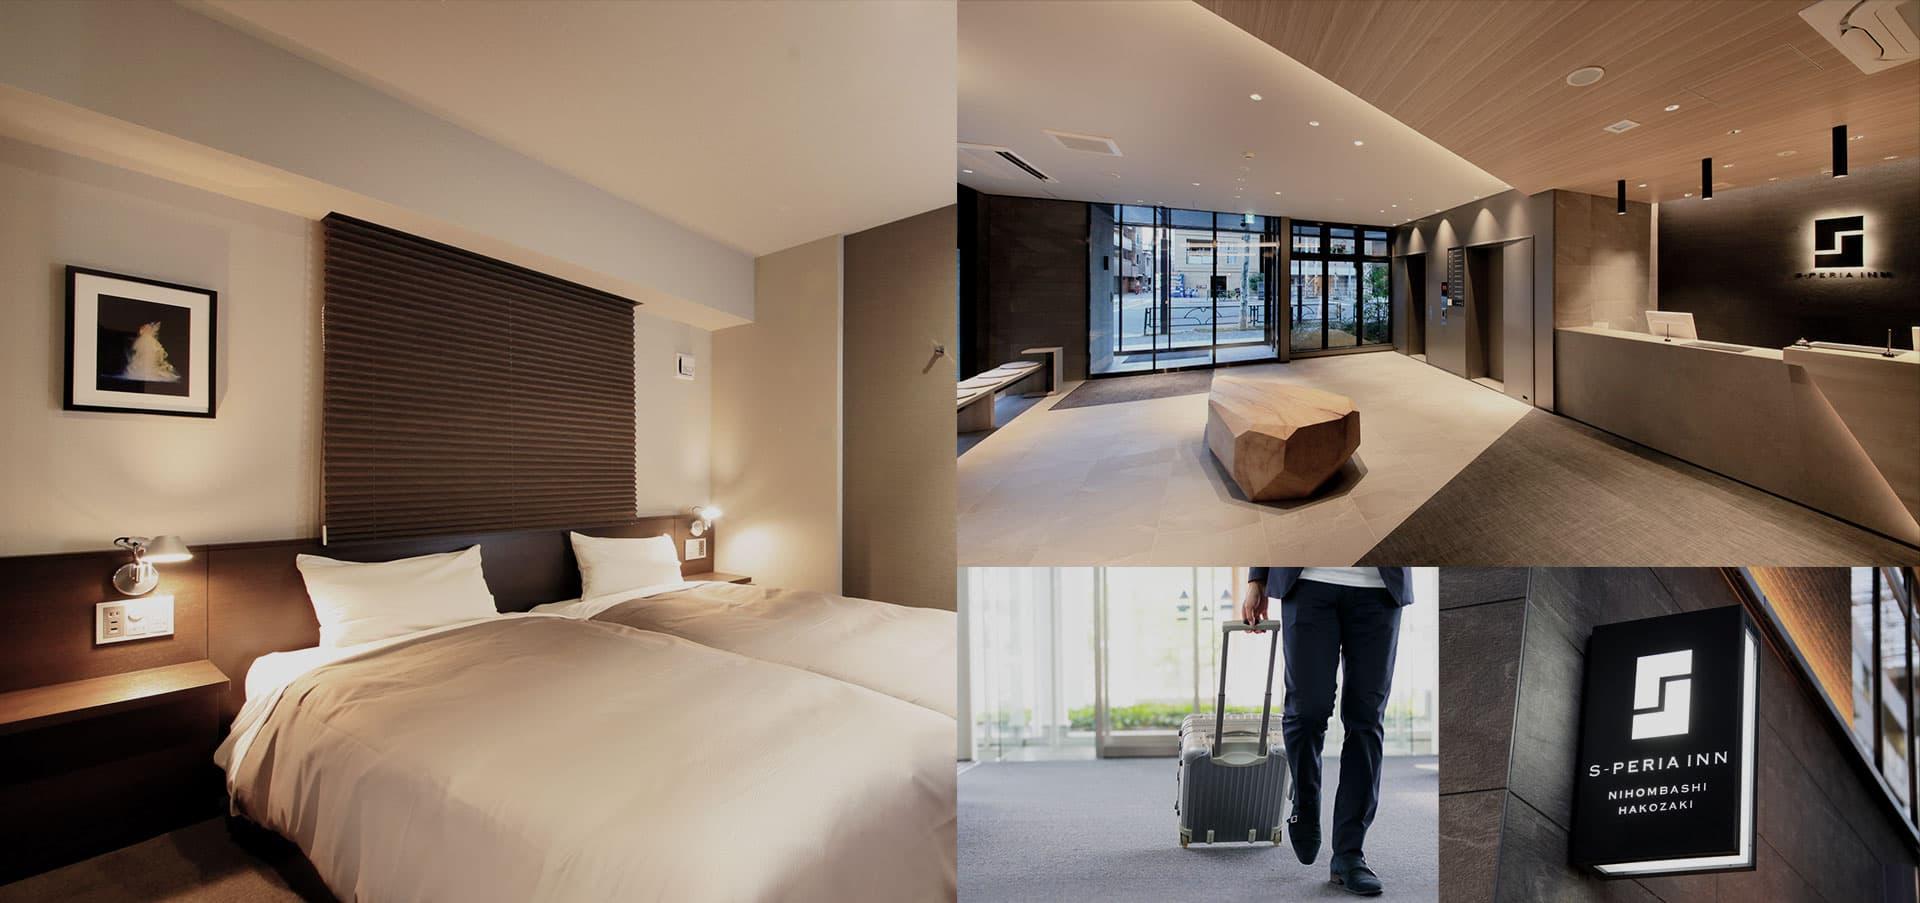 S-Peria Inn日本橋箱崎 2018年11月GRAND OPEN 步行3分鐘便可抵達東京城市航空總站。摩登時尚飯店誕生,不論商務觀光都適用。